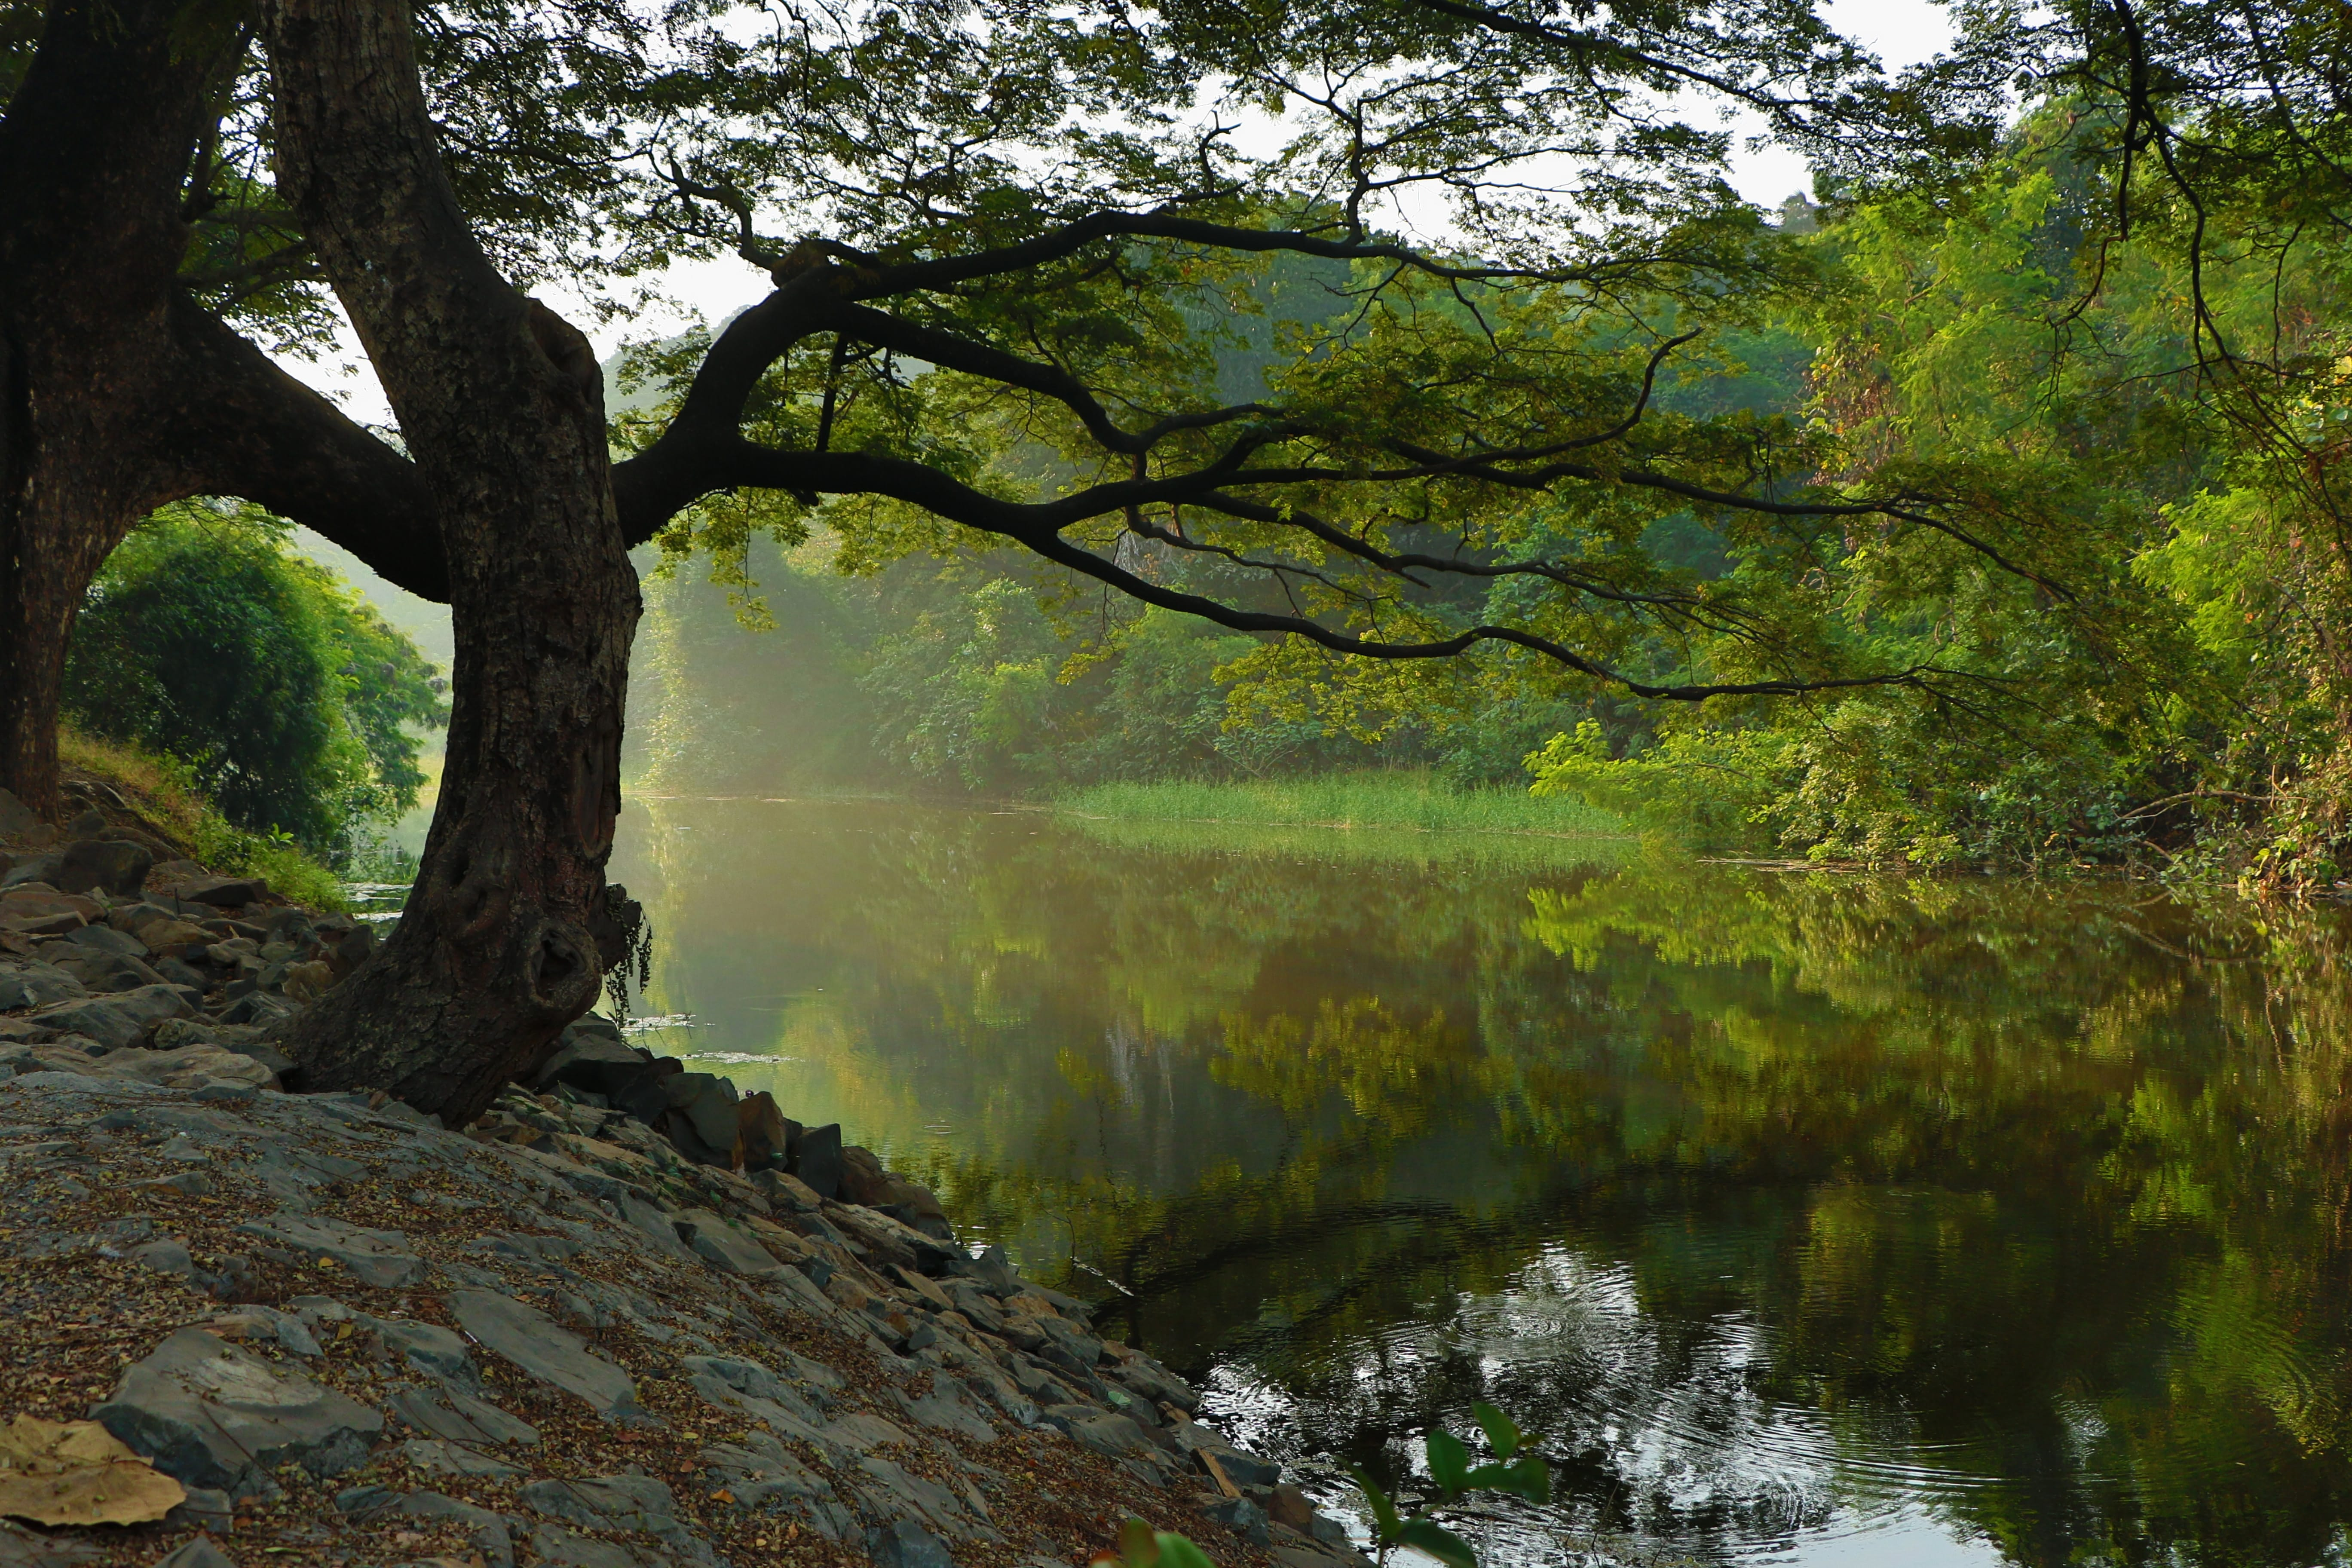 Bare tree by lake; image by Natish Kadam, via Unsplash.com.